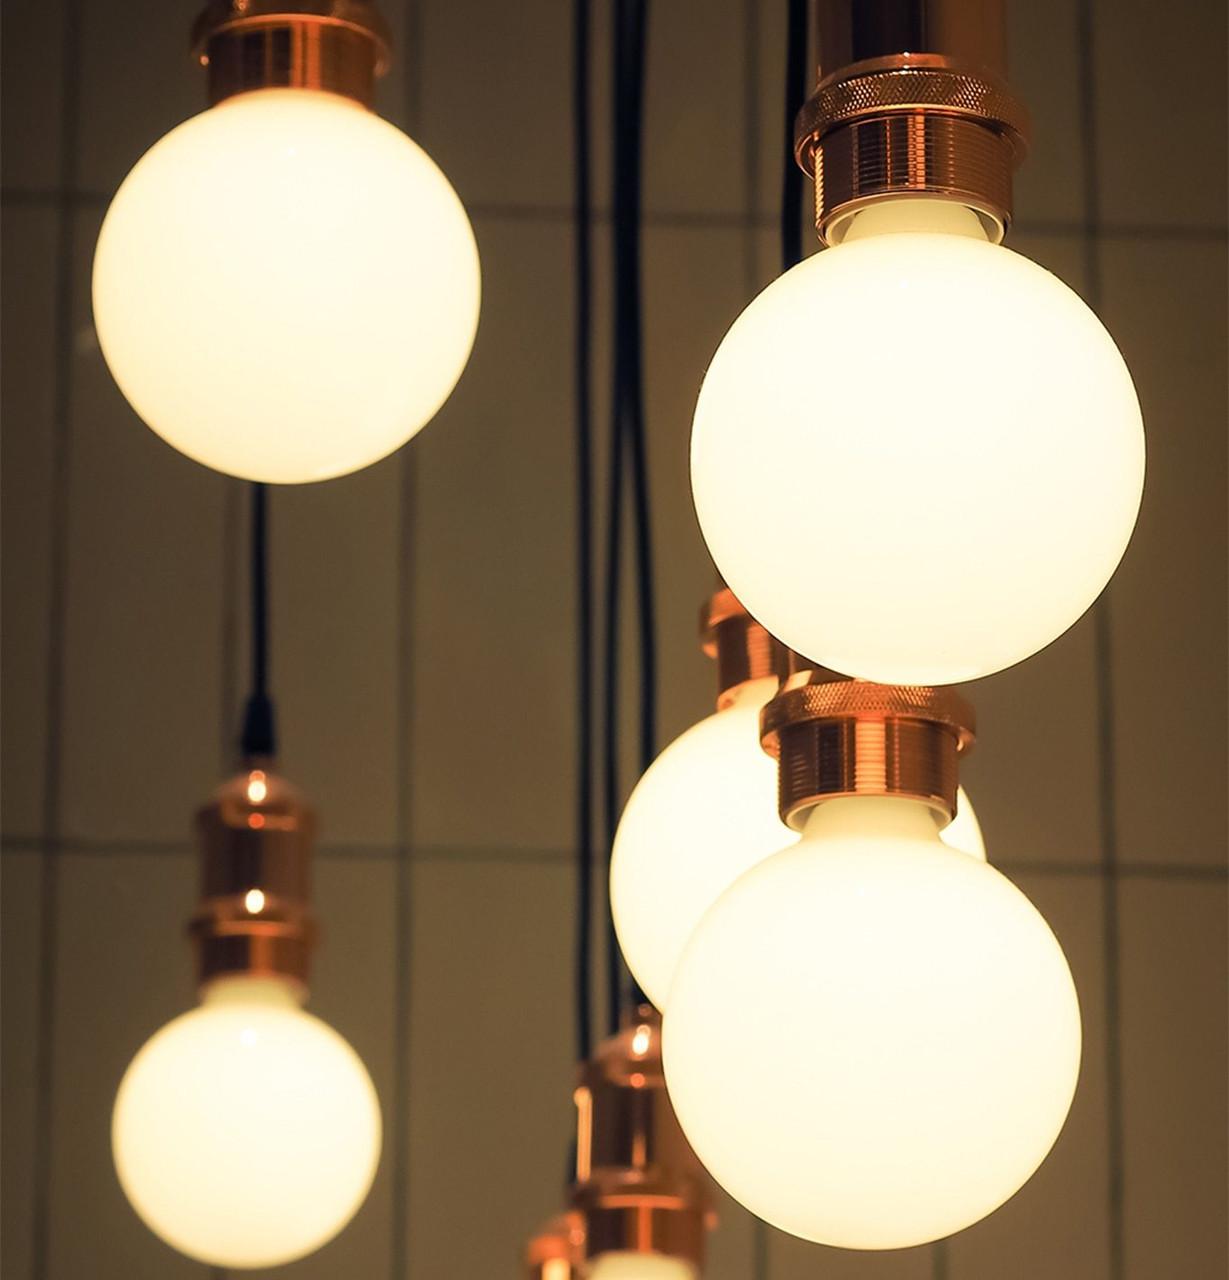 LED Globe Bayonet Light Bulbs